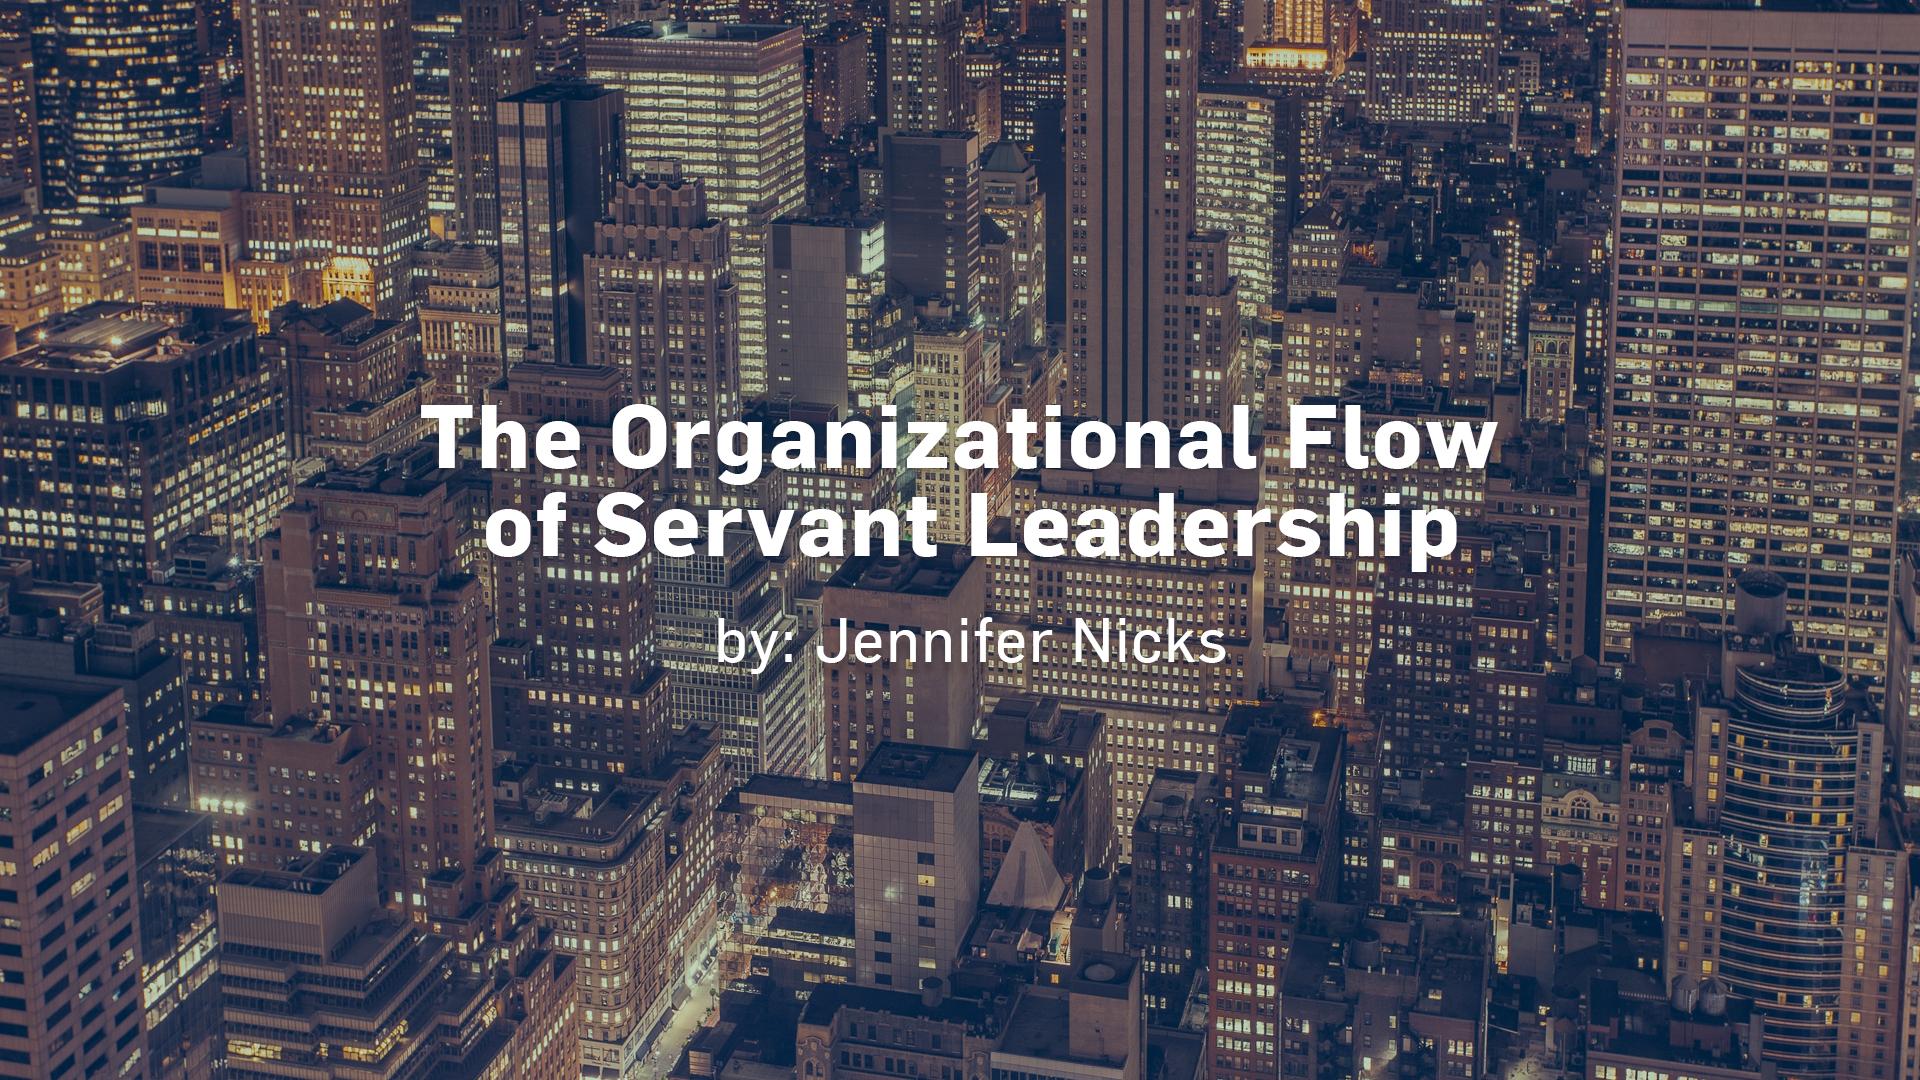 The Organizational Flow of Servant Leadership 1920x1080.jpg